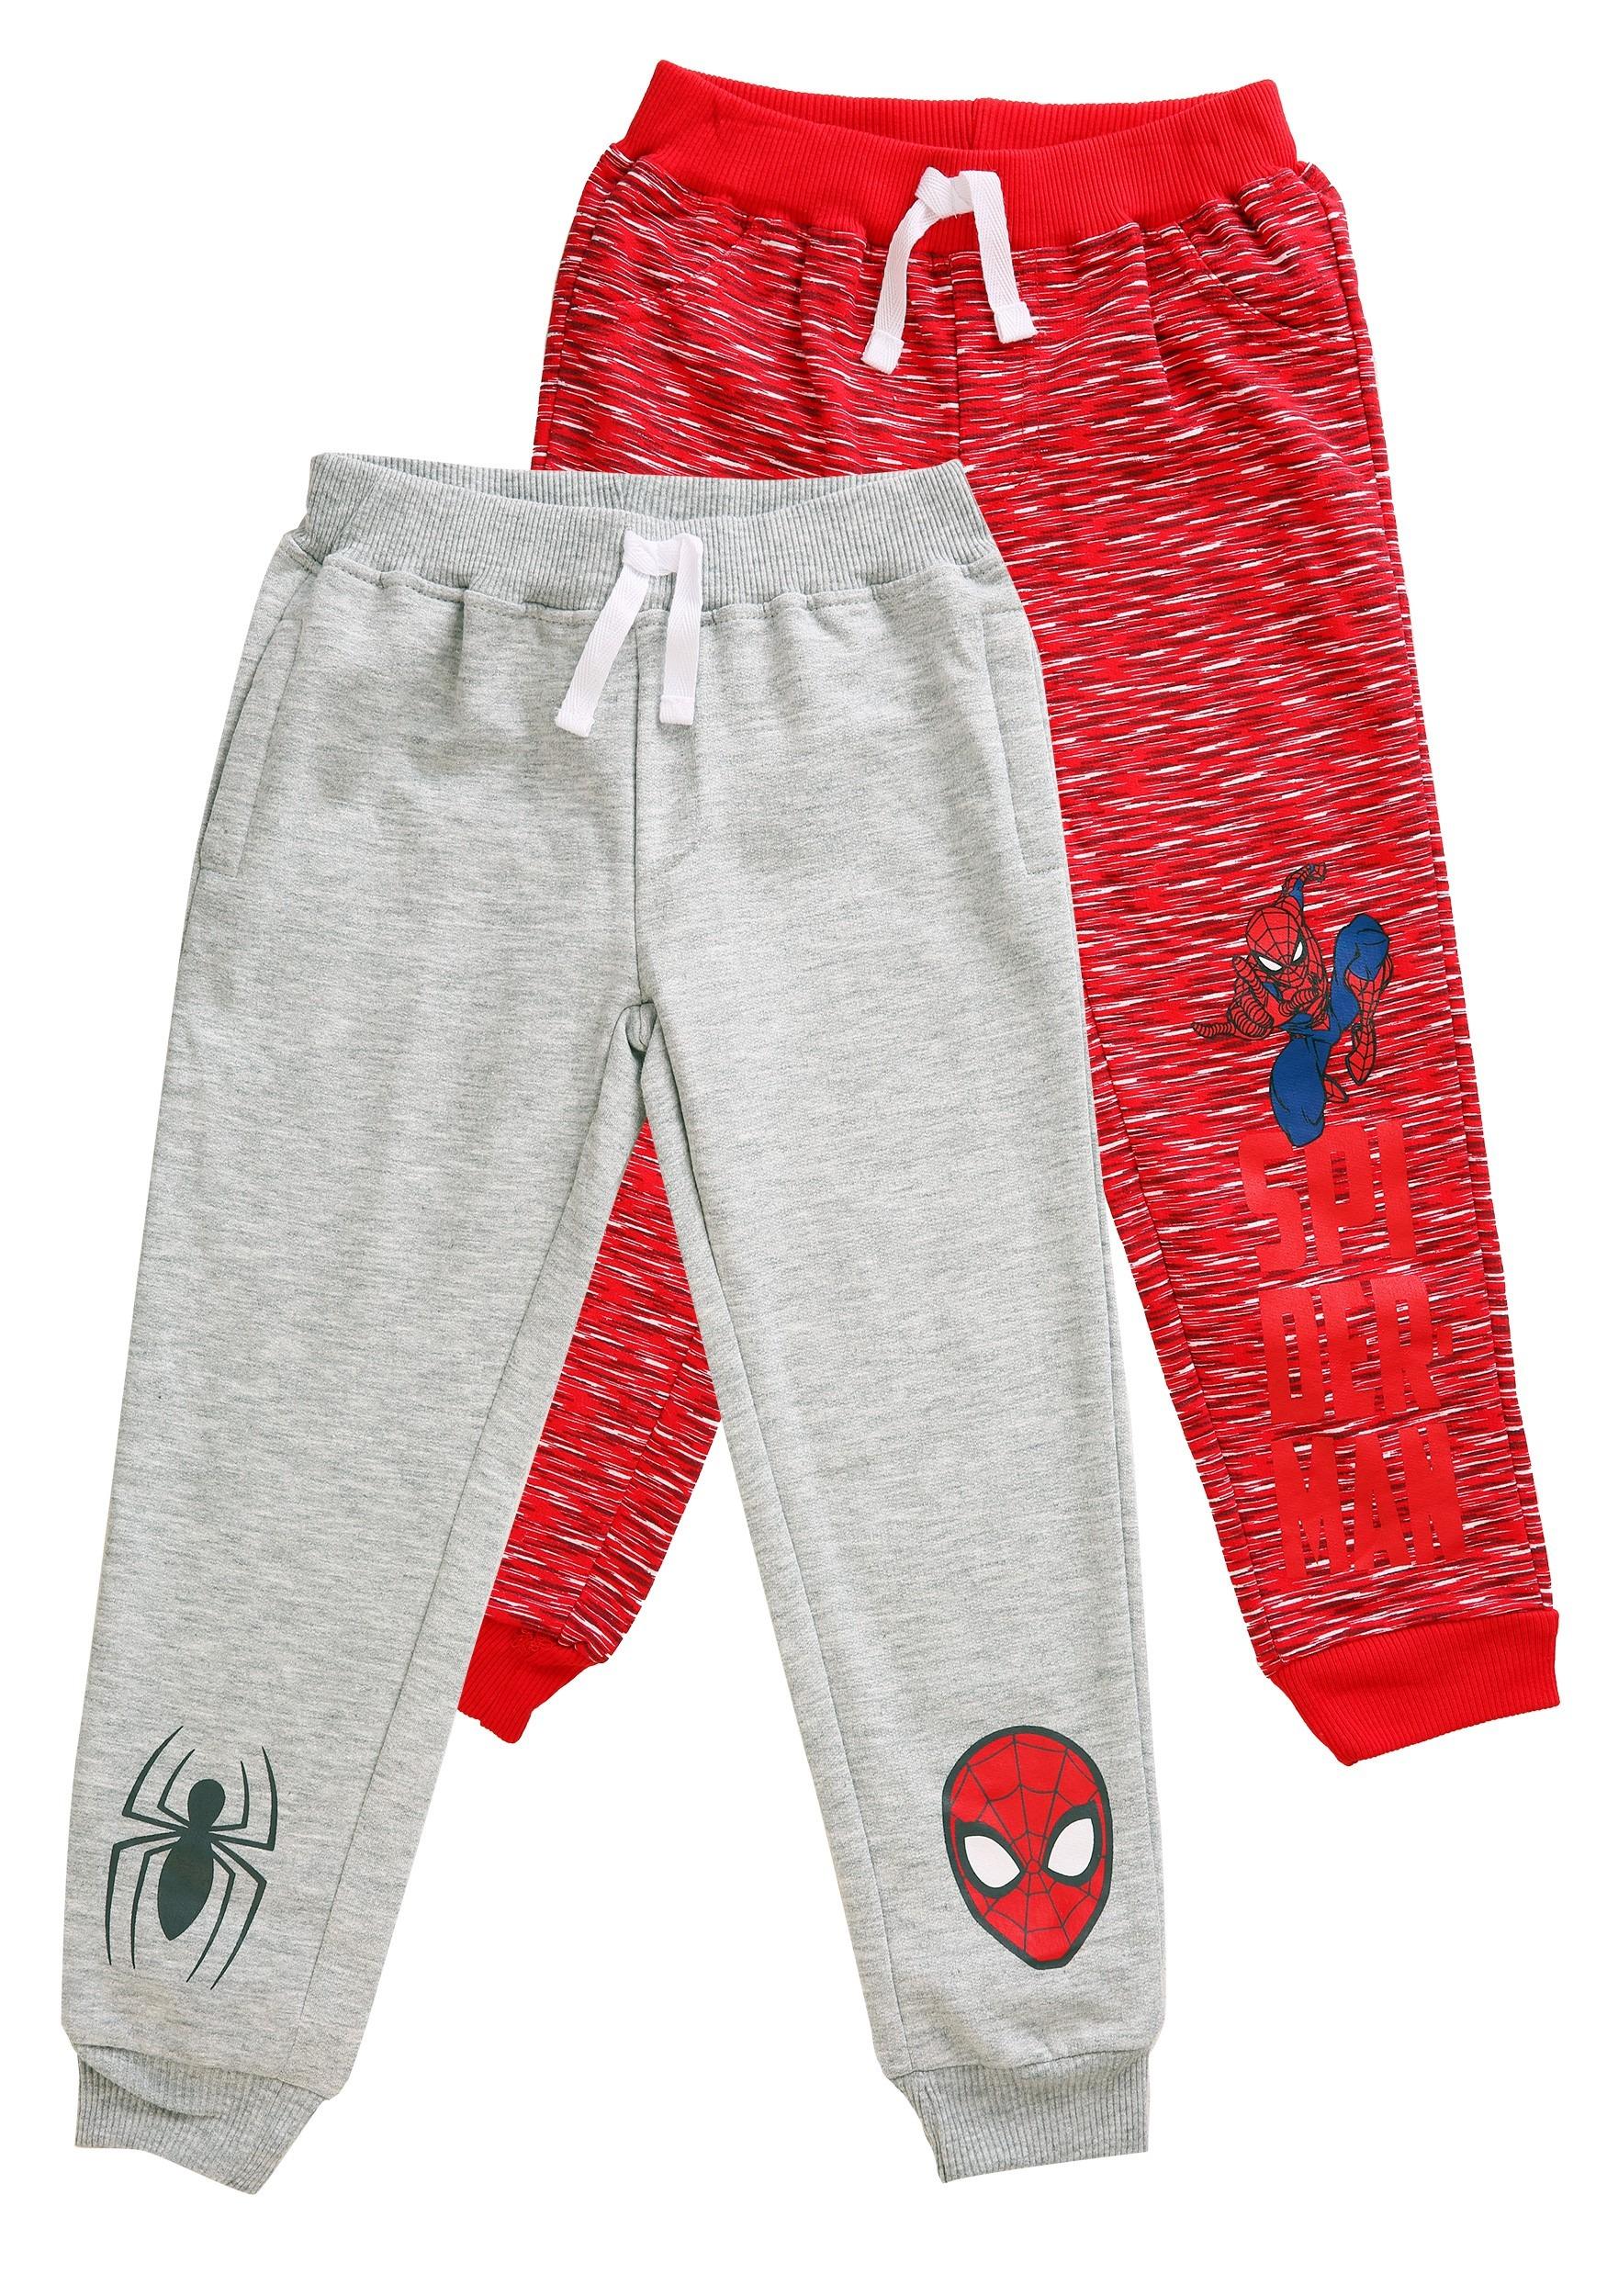 Spiderman Boys Tank Tops Pack of 2